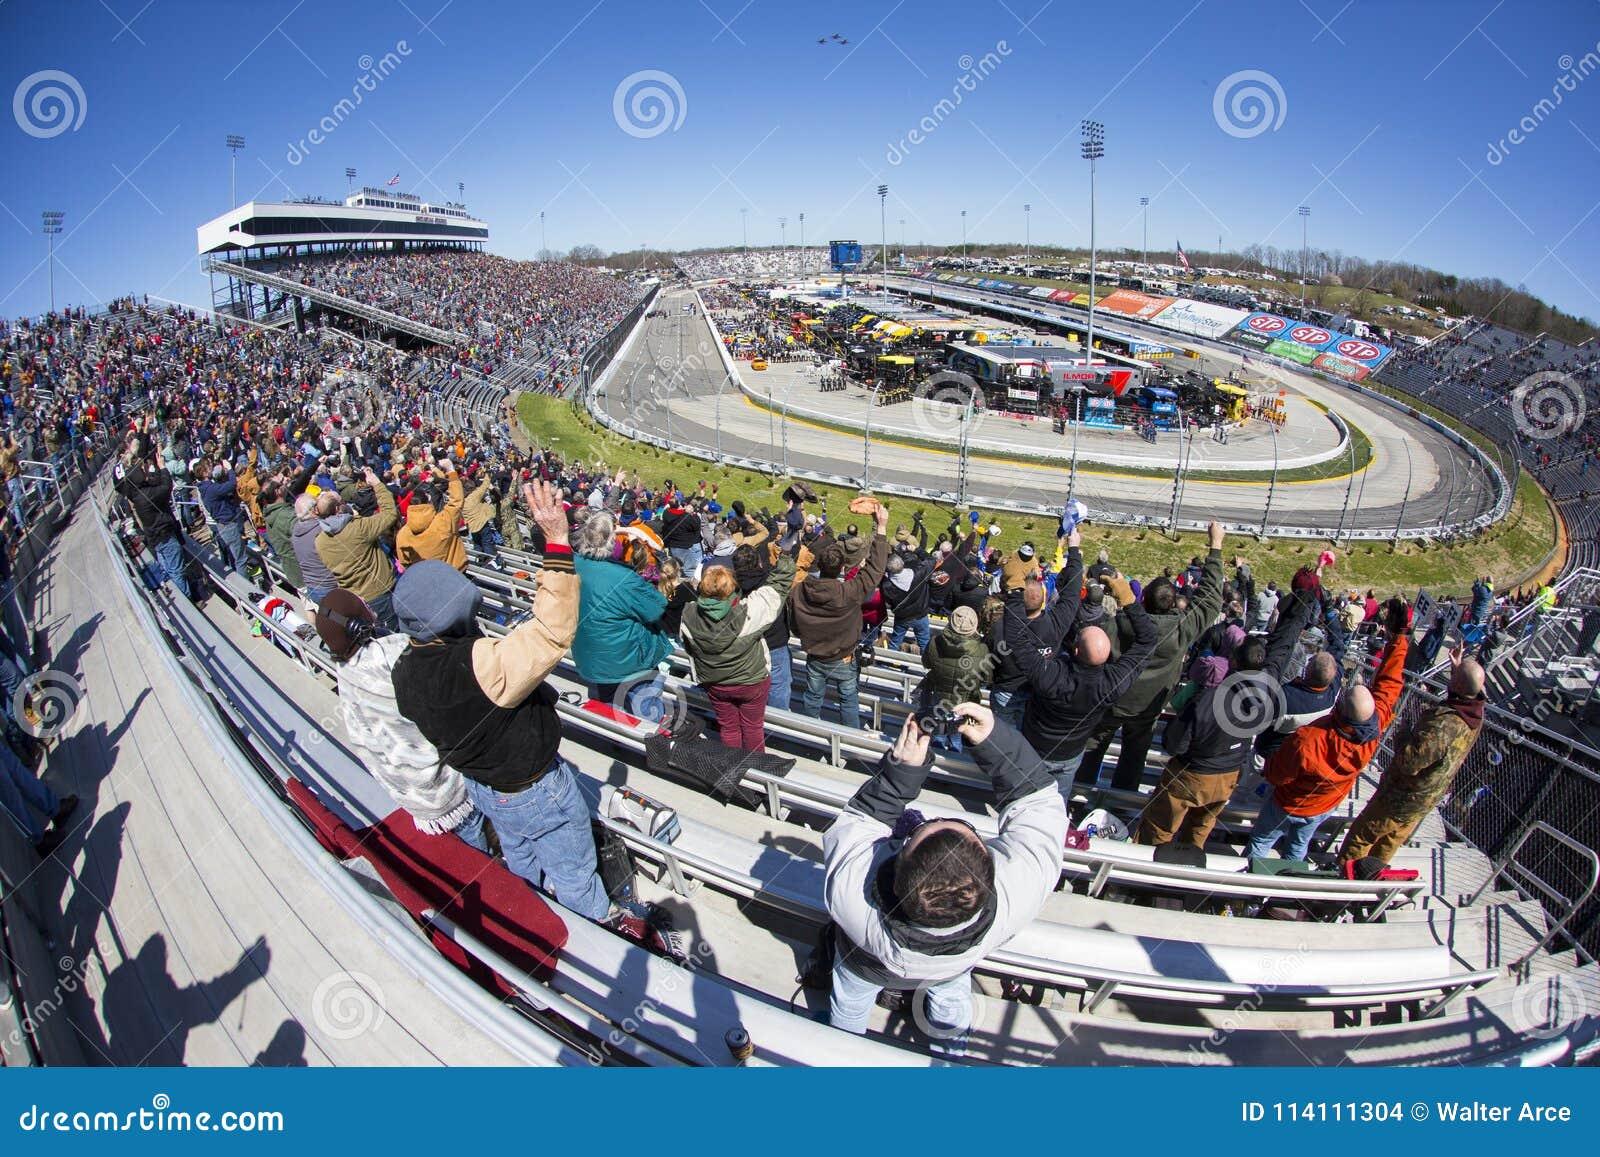 NASCAR: Mars 26 STP 500